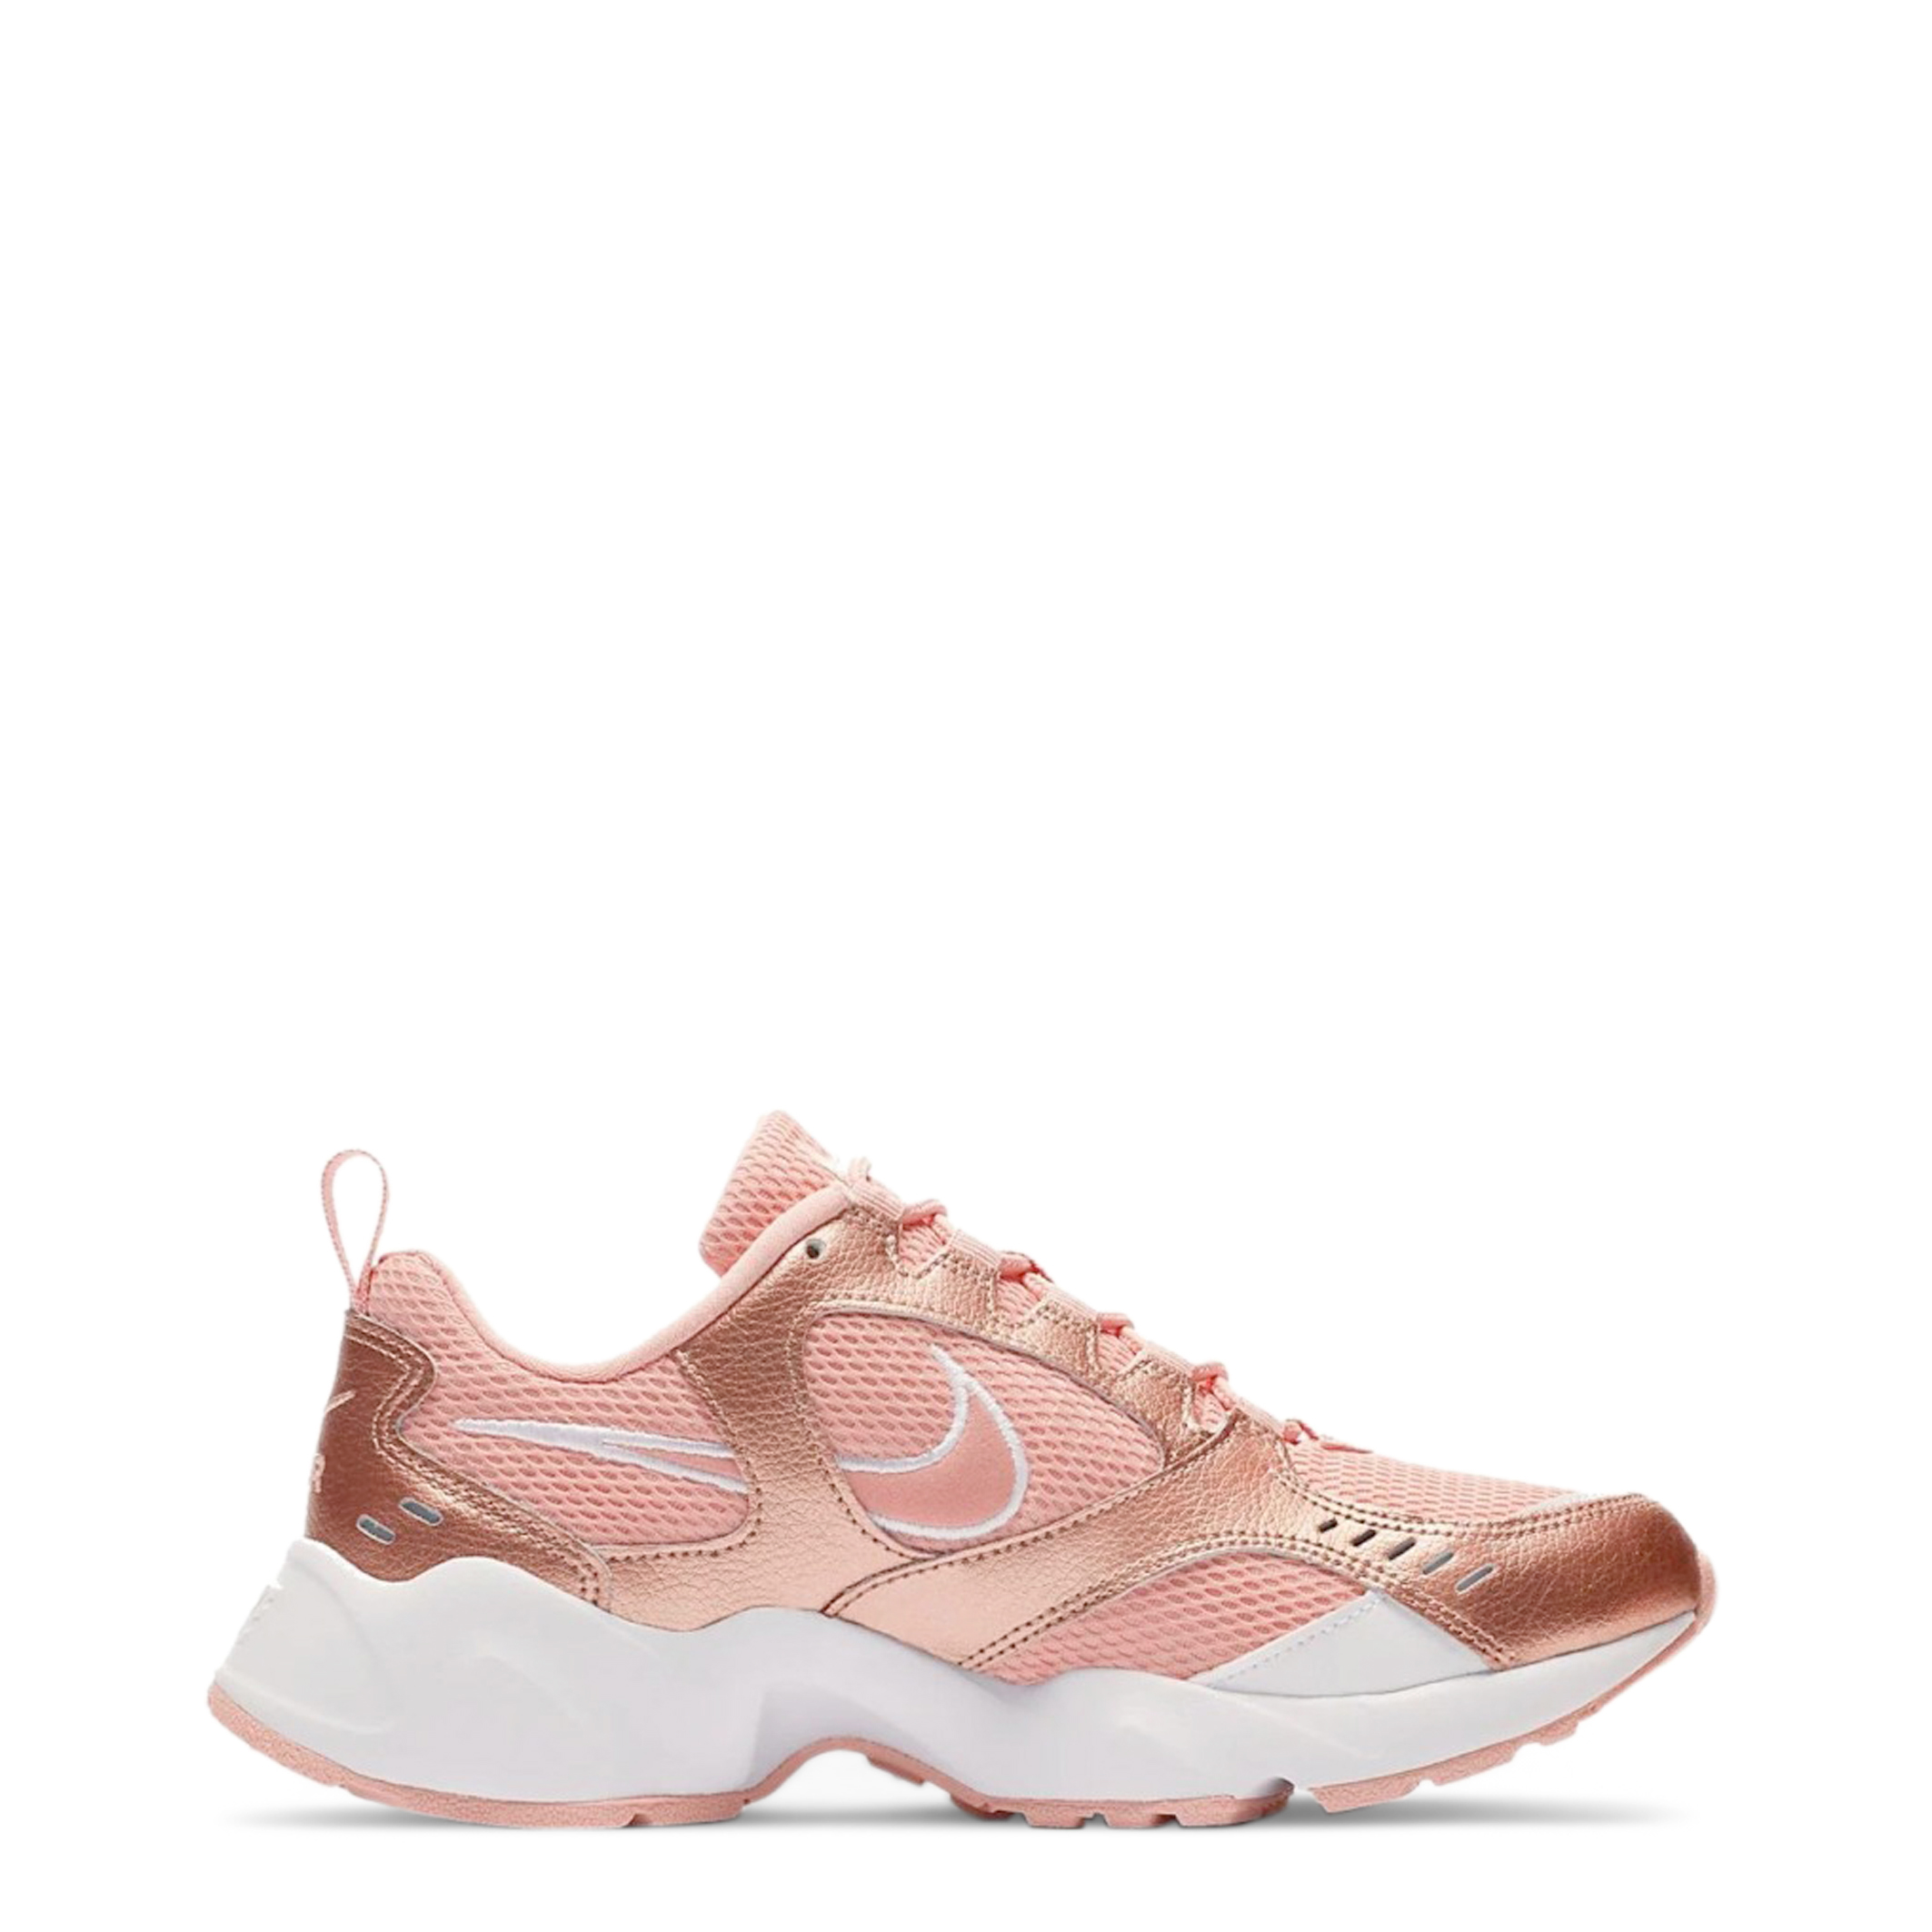 Baskets / Sneakers  Nike AirHeights-CI0603_600 pink